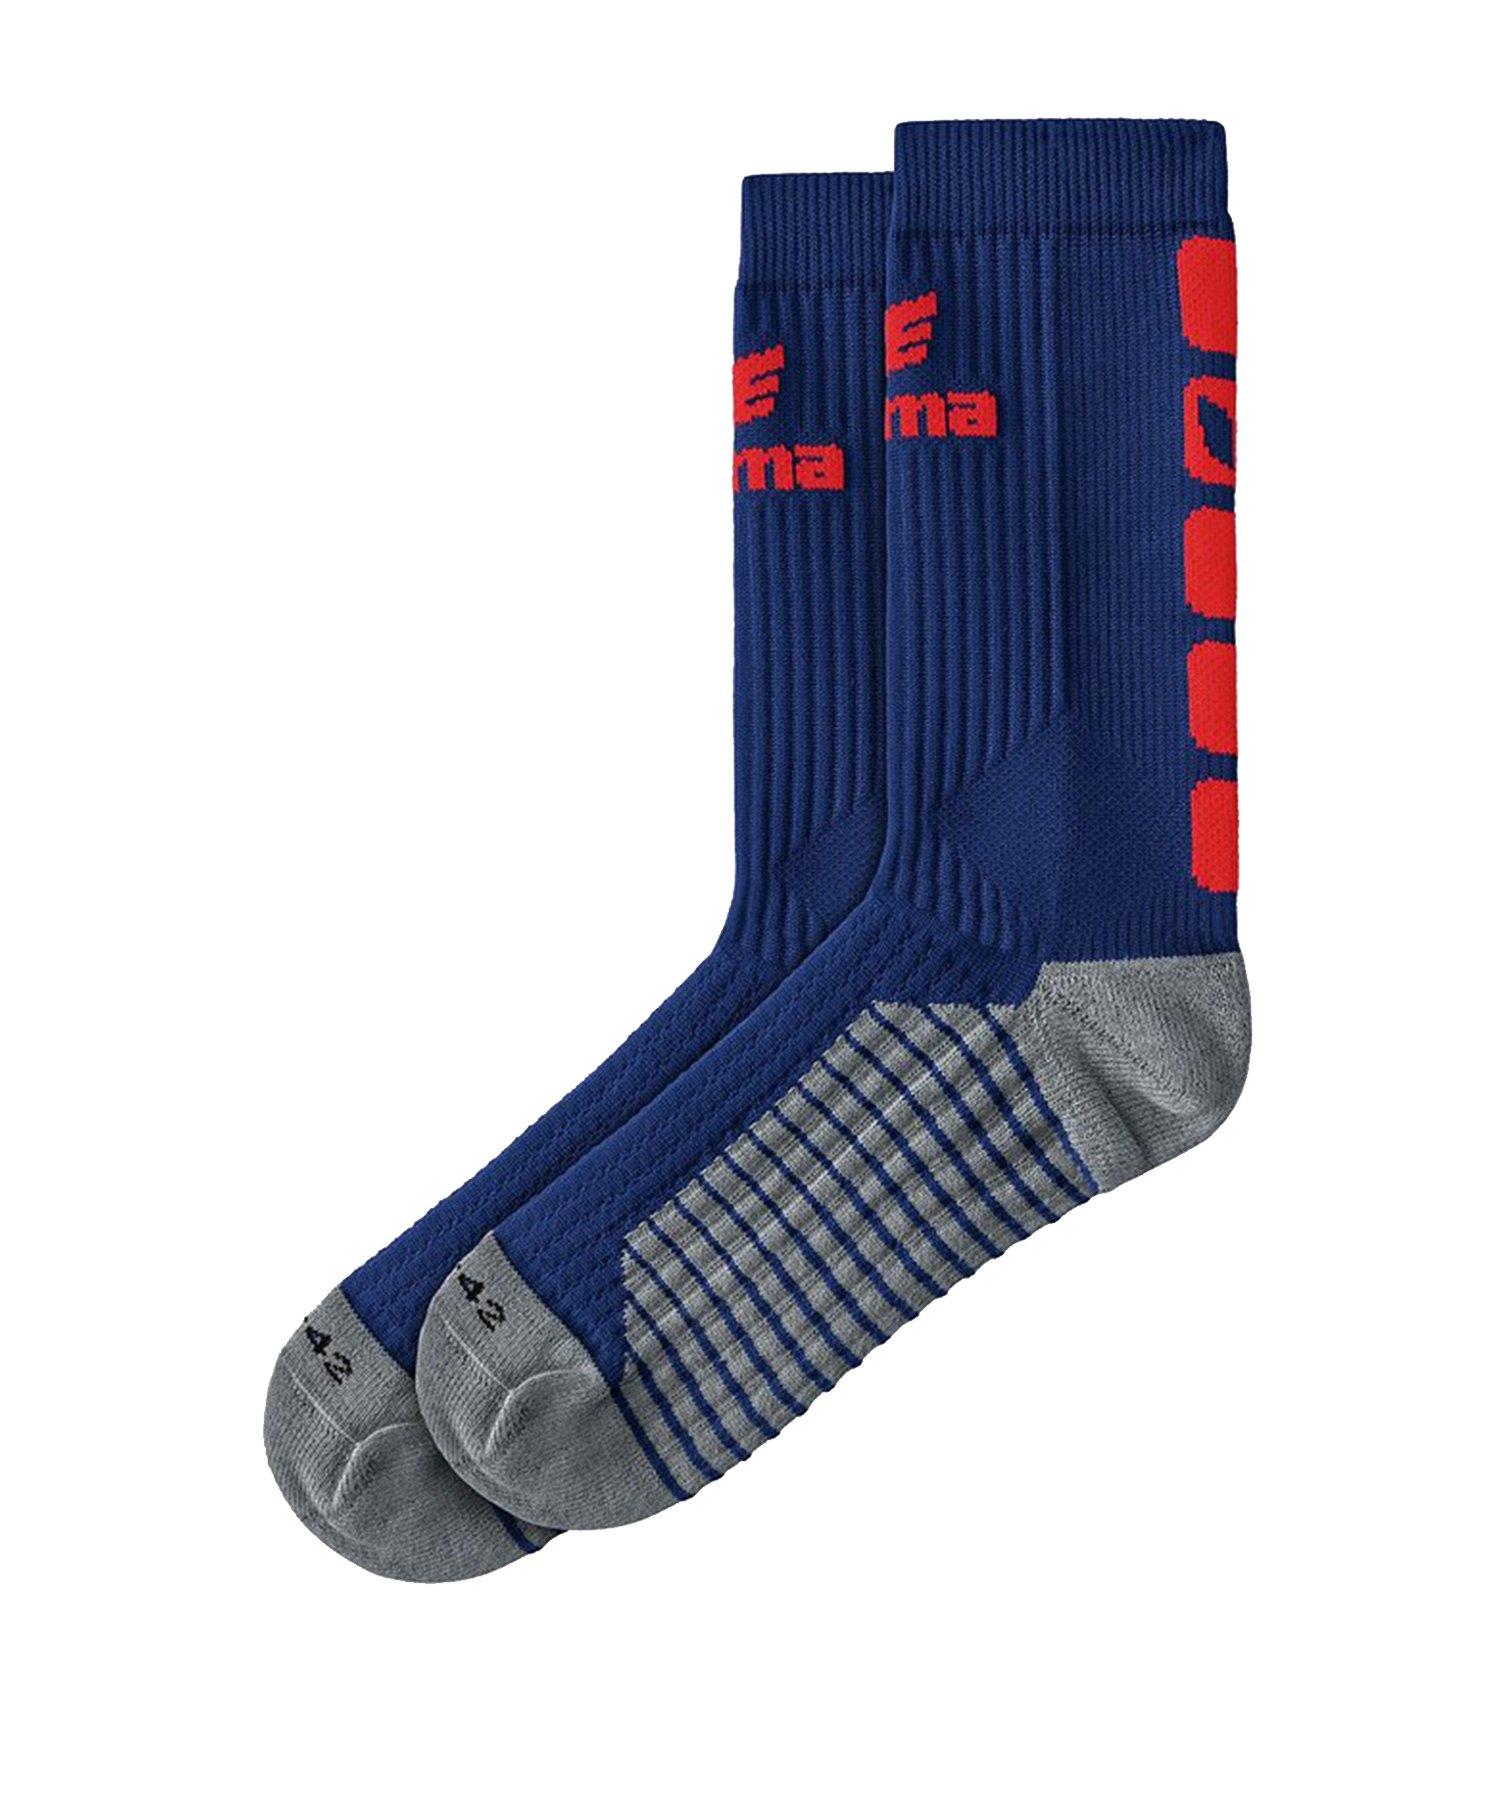 Erima CLASSIC 5-C Socken Blau Rot - Blau